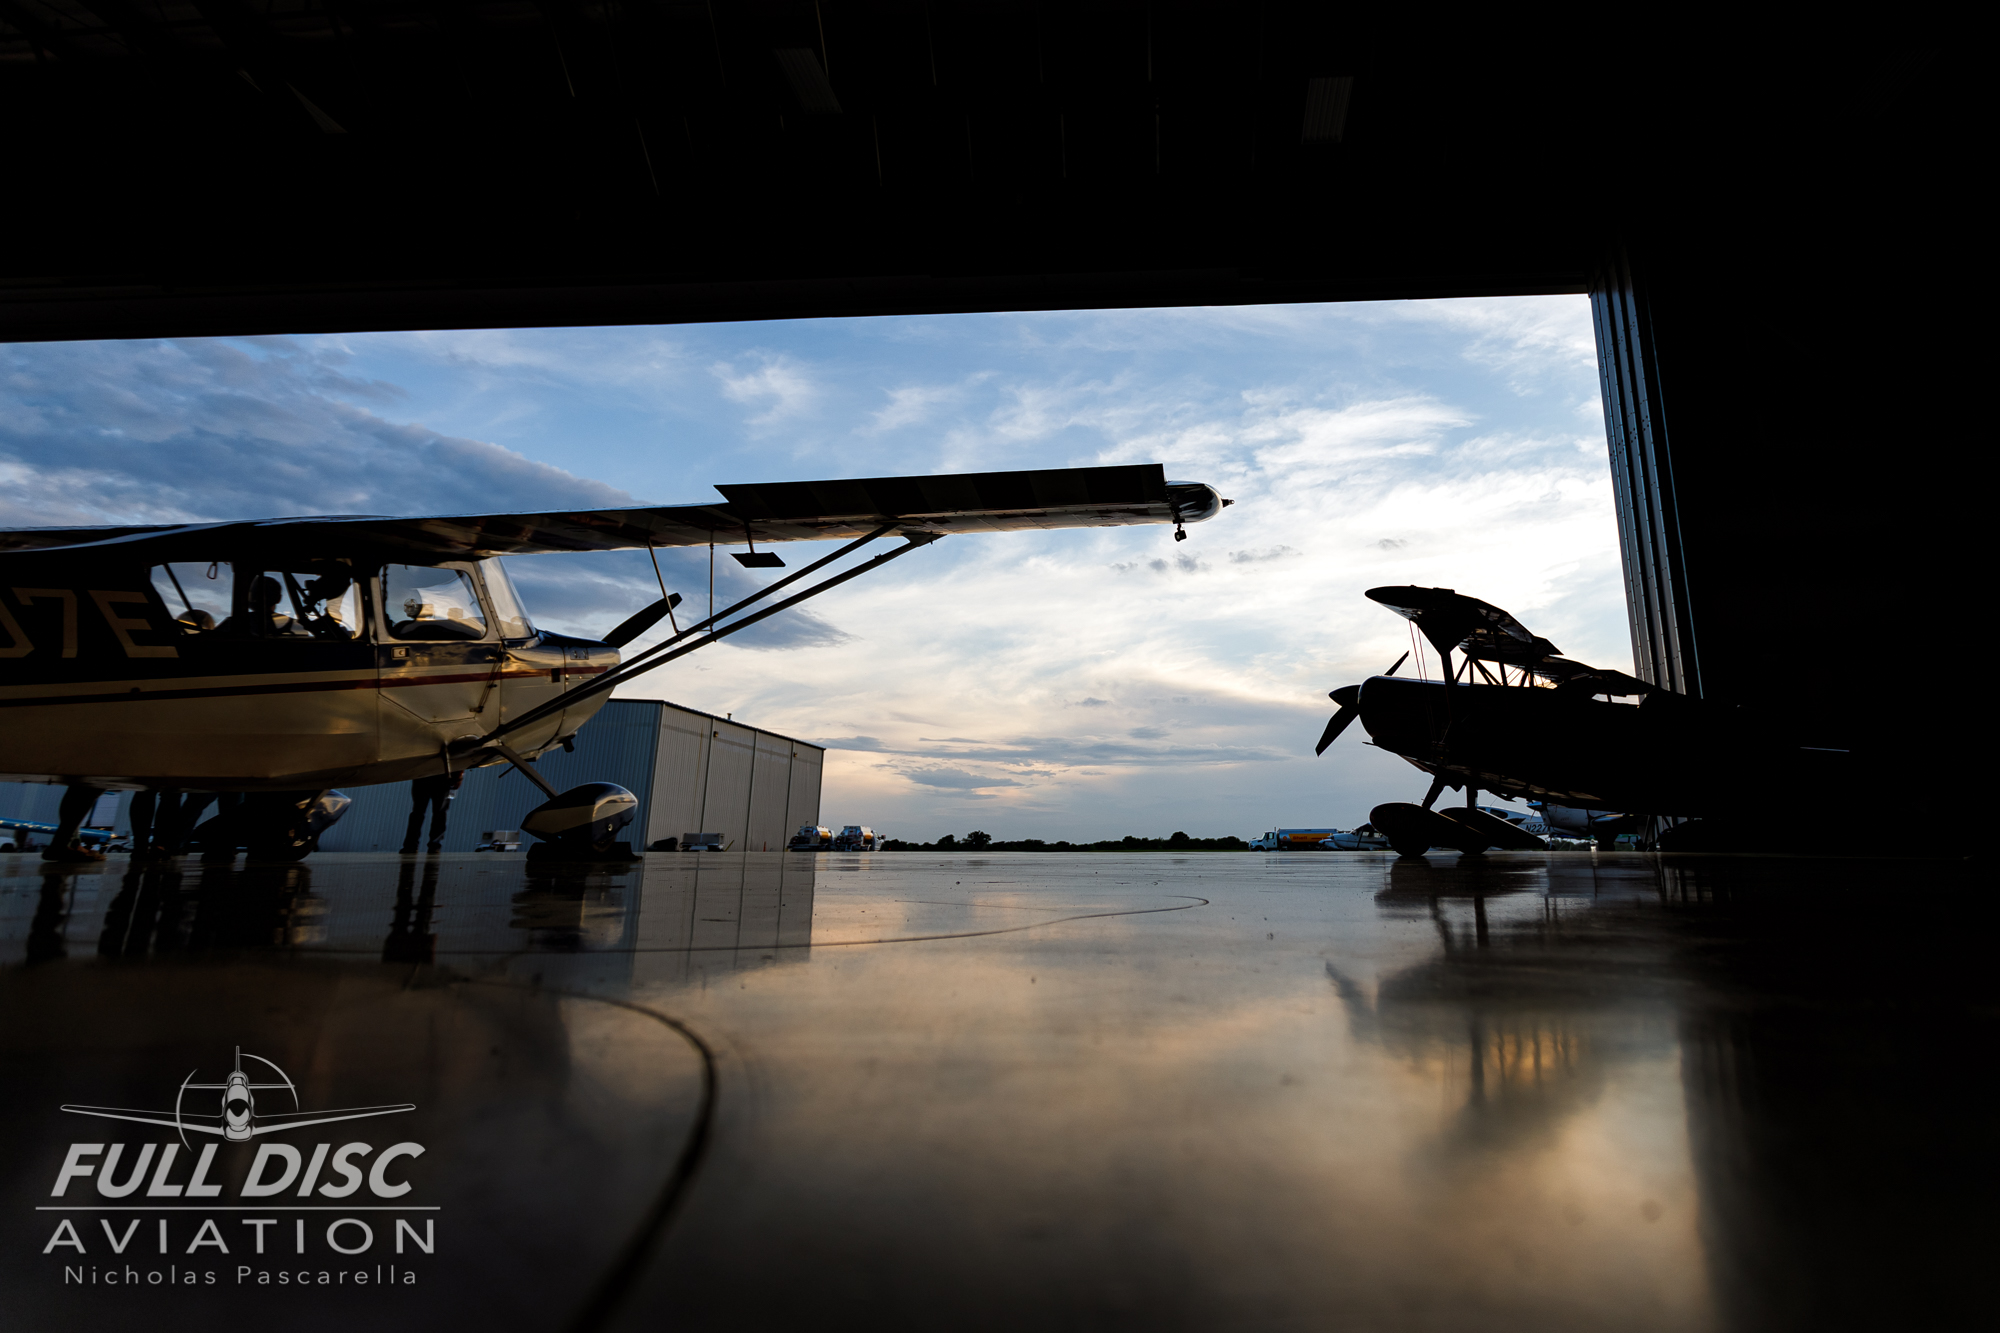 chefpitts_rjgritter_nickpascarella_fulldiscaviation_hangar_sunset.jpg